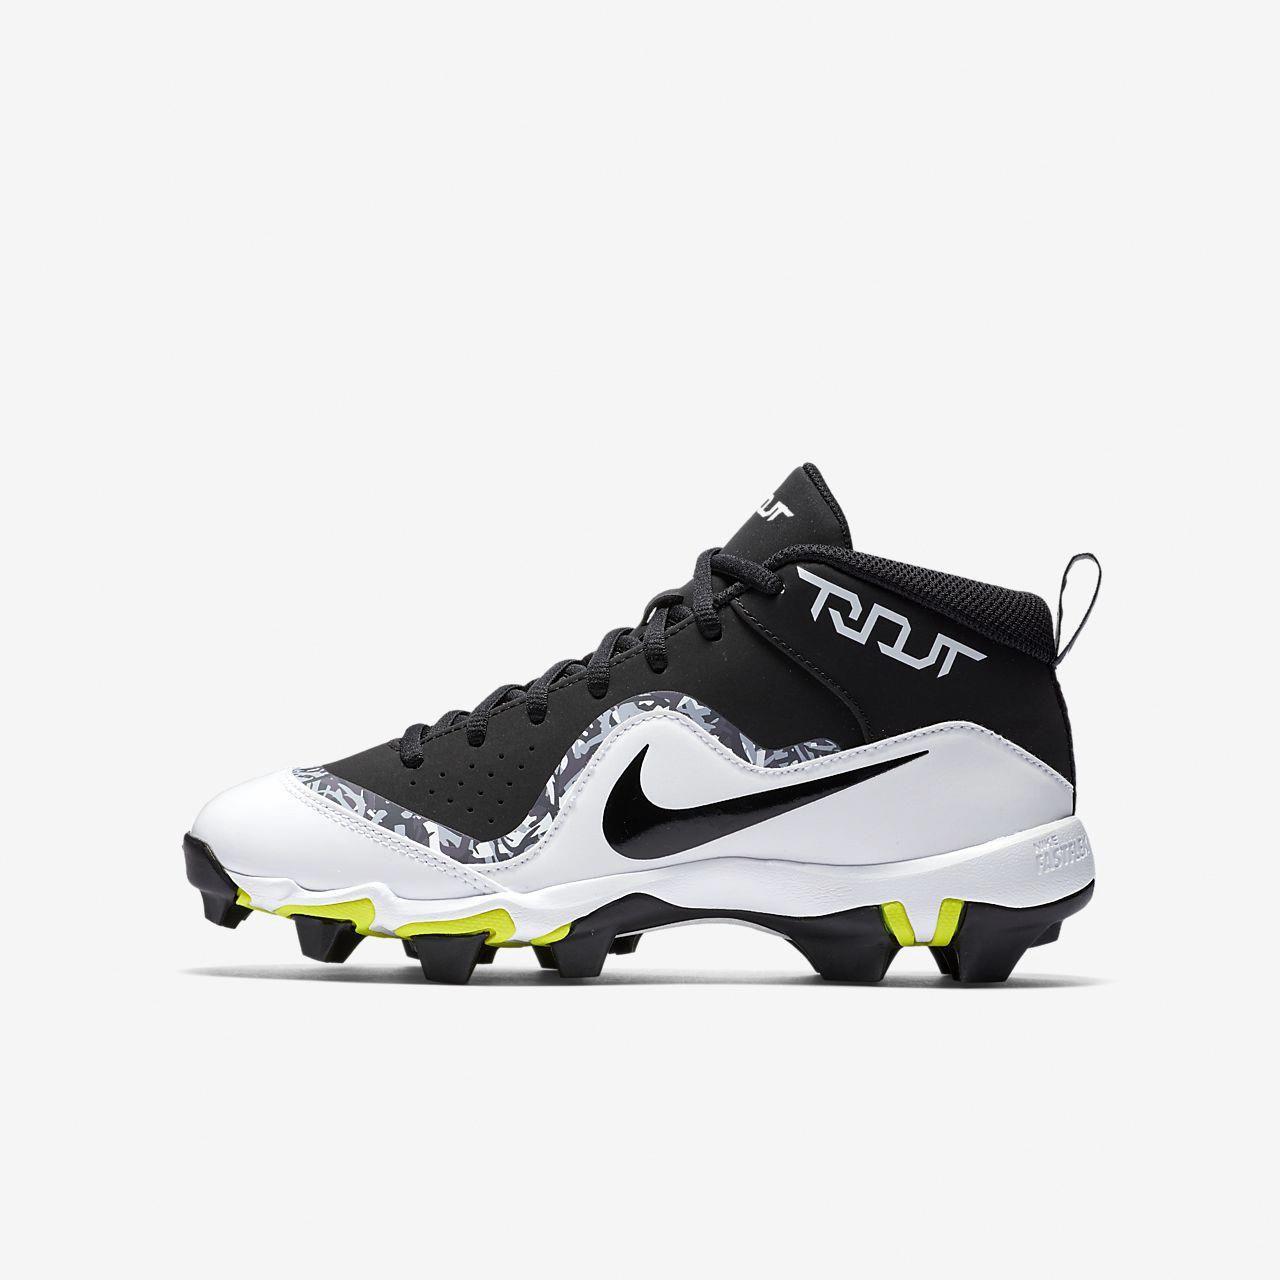 f23b263d569 Nike Force Trout 4 Keystone Little Big Kids  Baseball Cleat - 1.5Y   baseballcleats